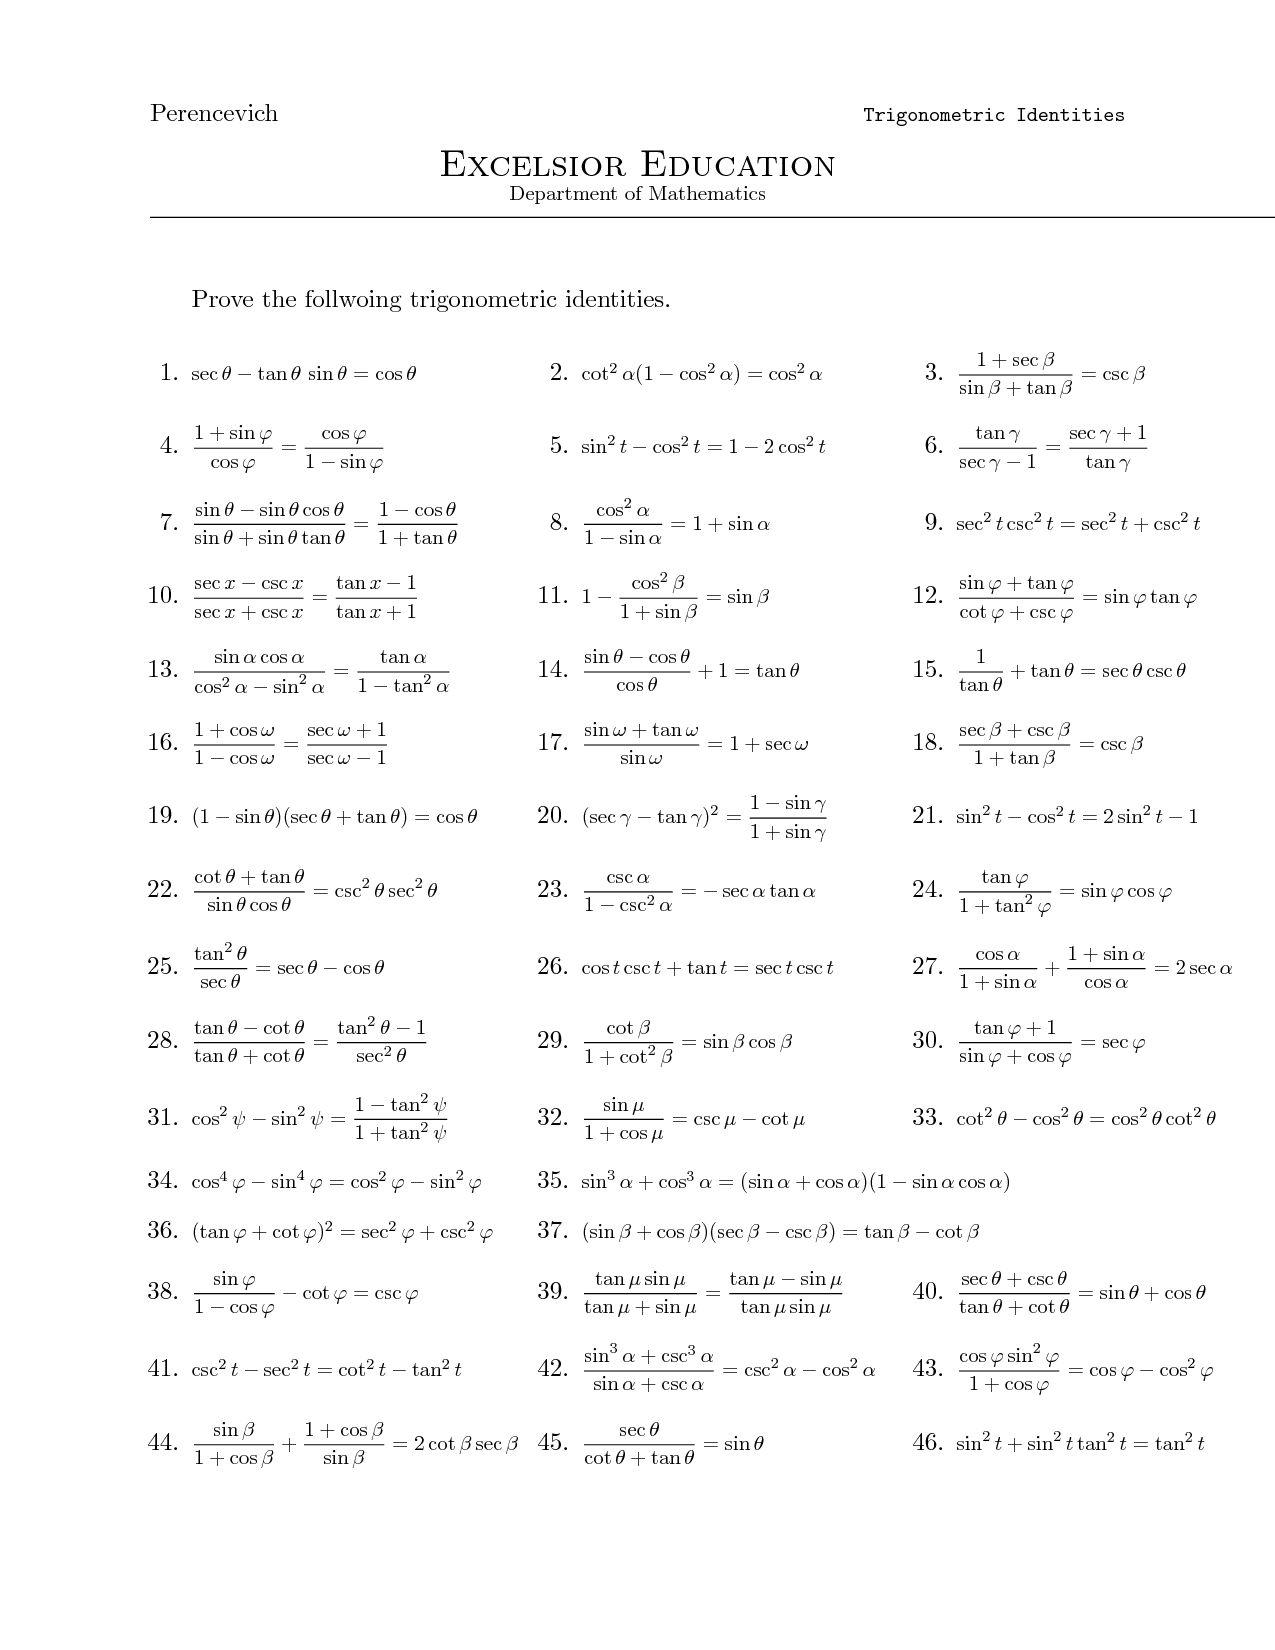 Proving Trigonometric Identities Worksheet With Answers